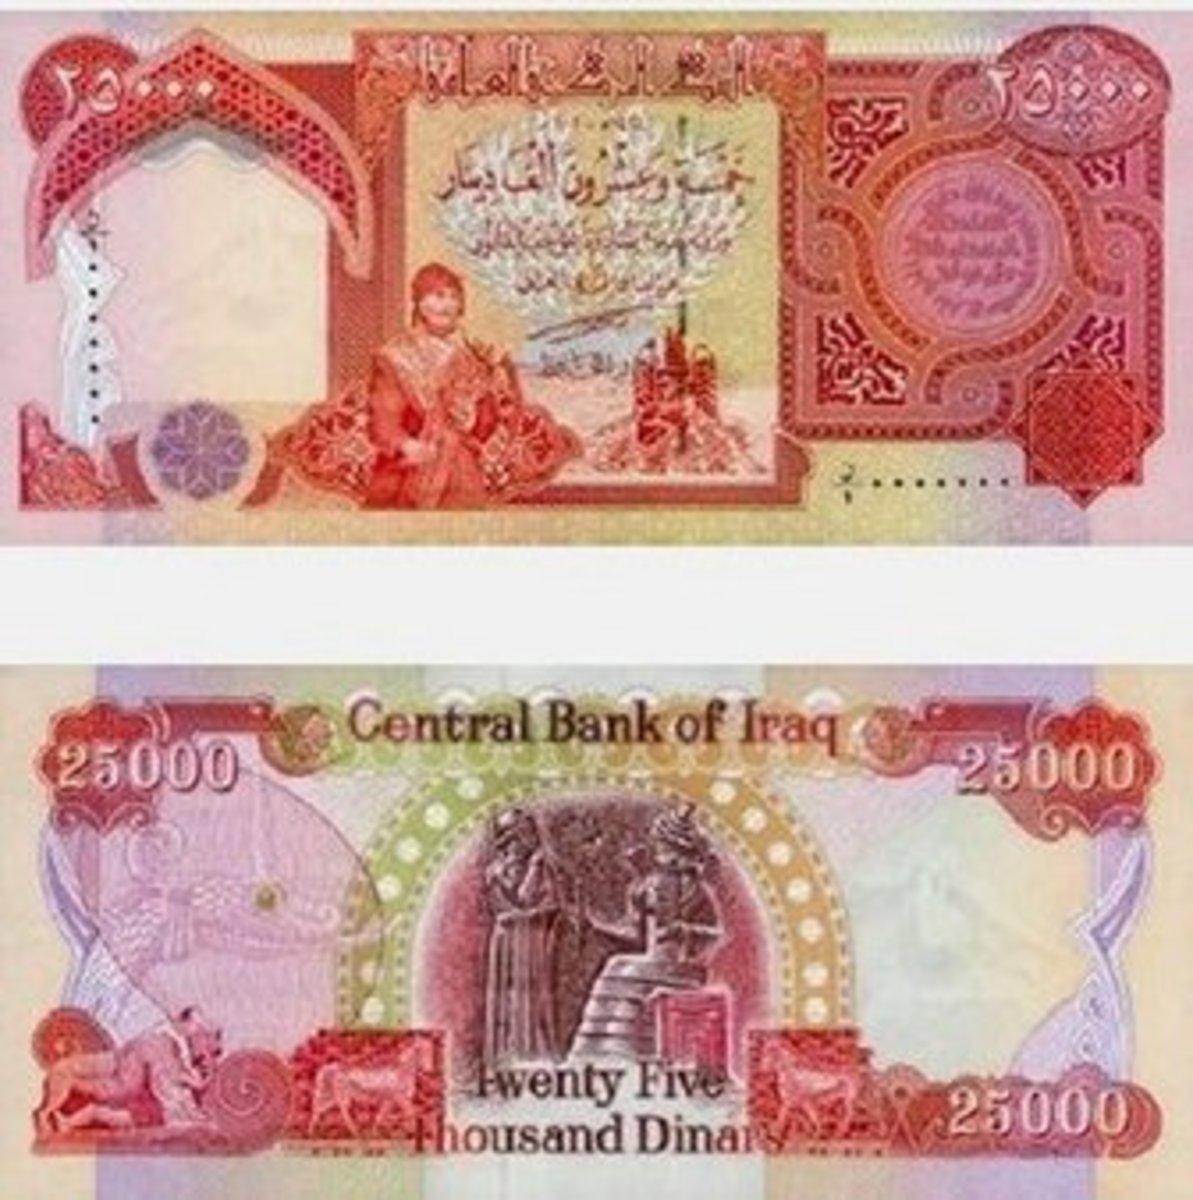 25000 Iraqi Dinar Note